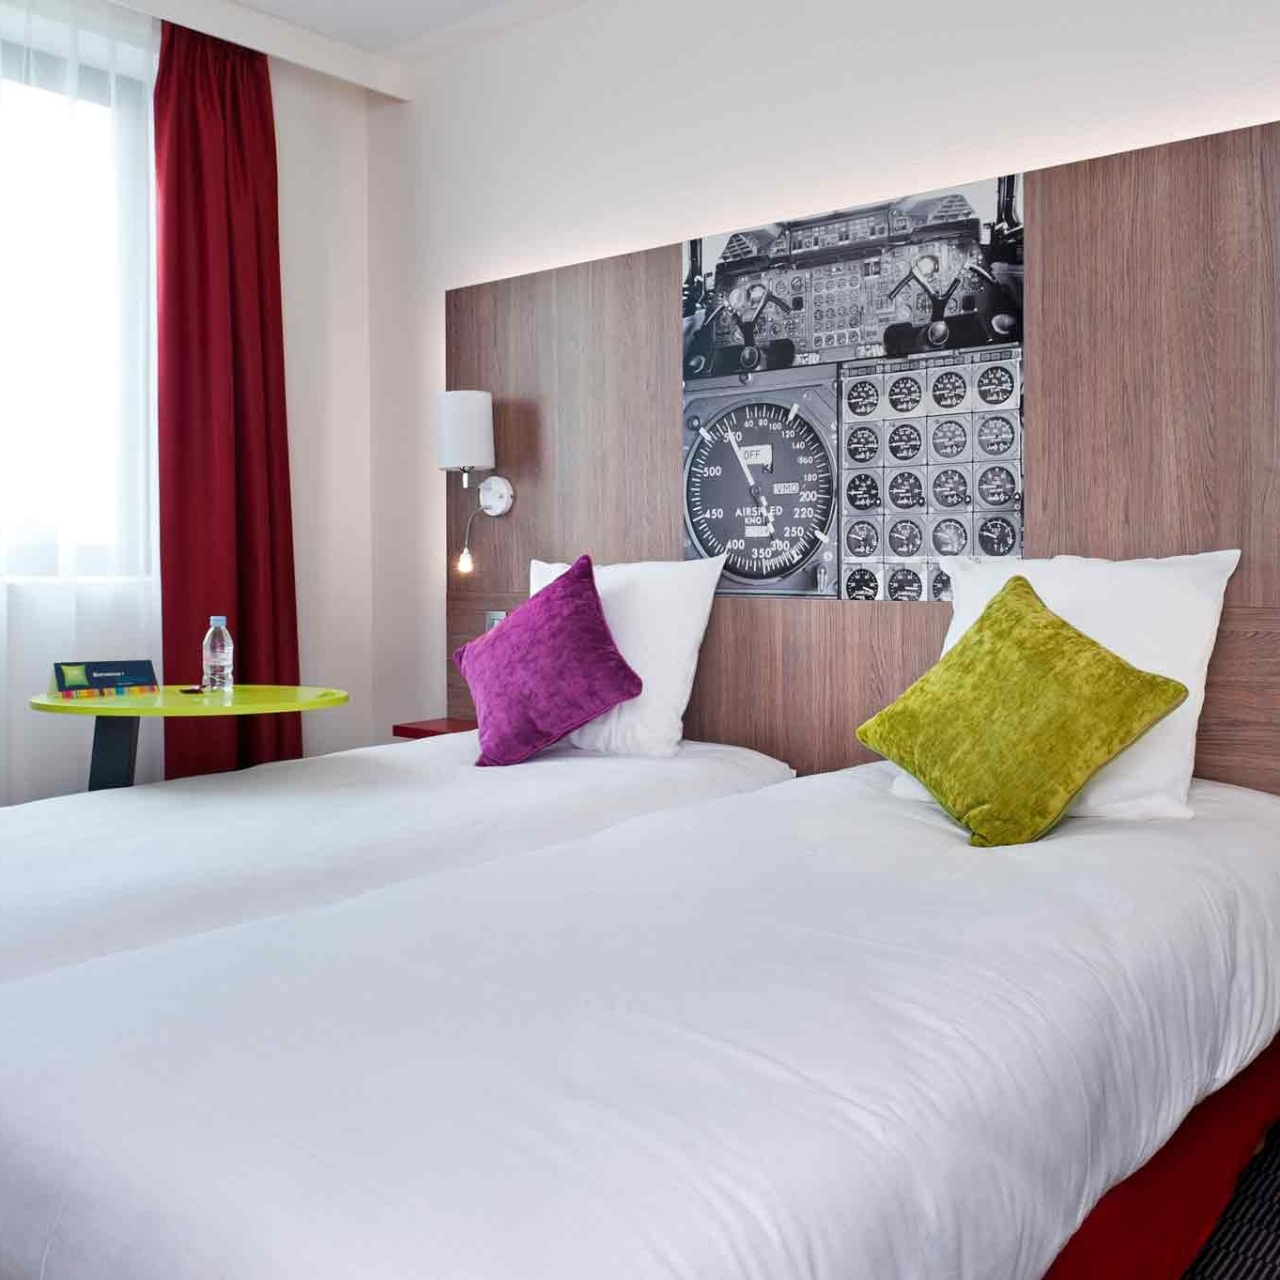 Design D Espace Toulouse hotel ibis styles toulouse cité espace - 3 hrs star hotel in